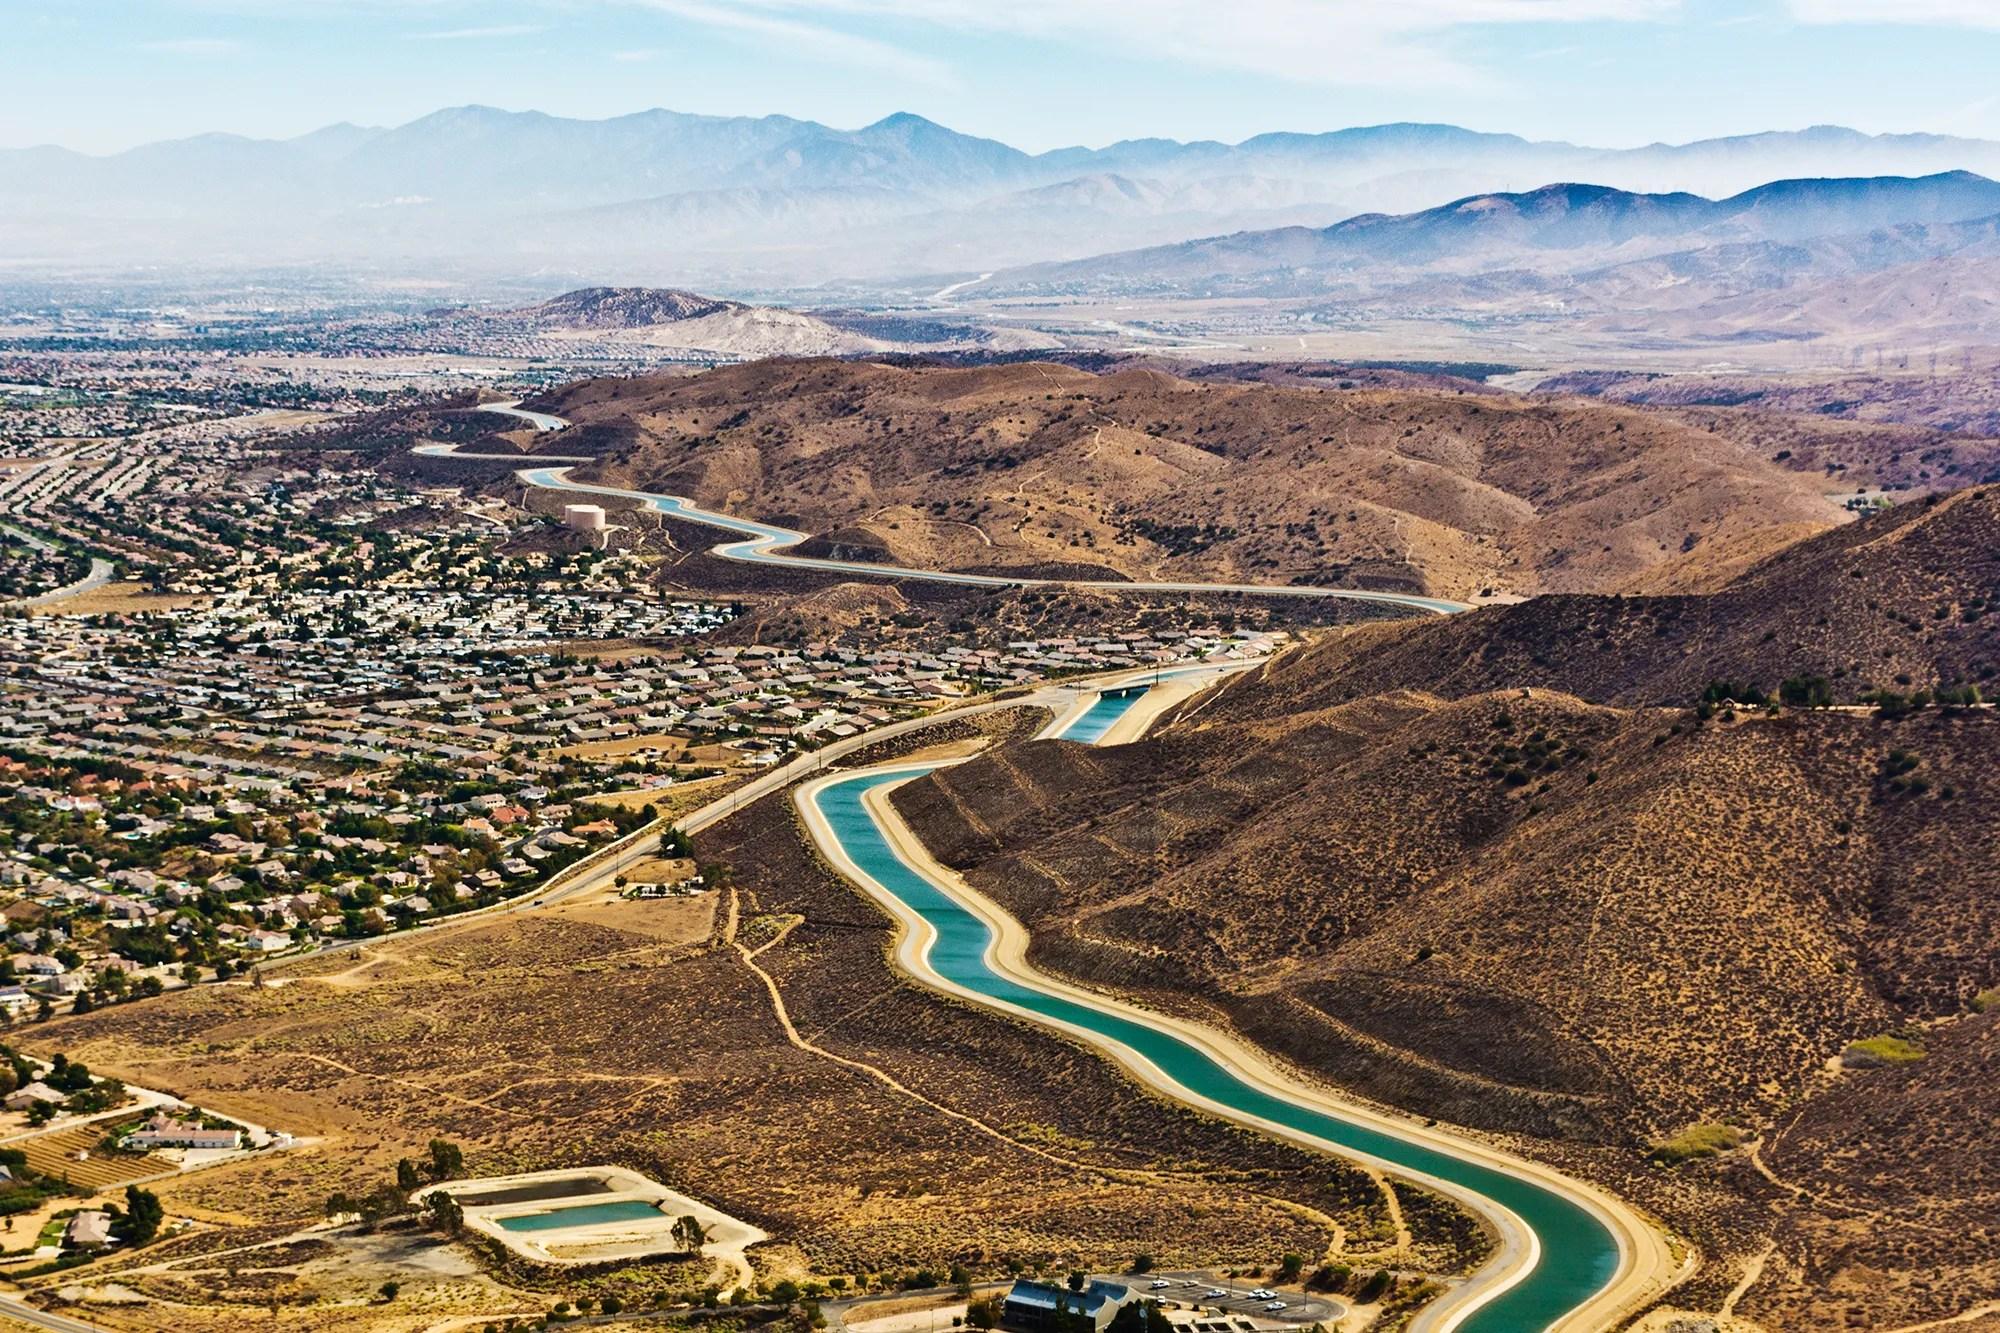 Devastating Chart Shows Why El Nio Wont Fix the Drought